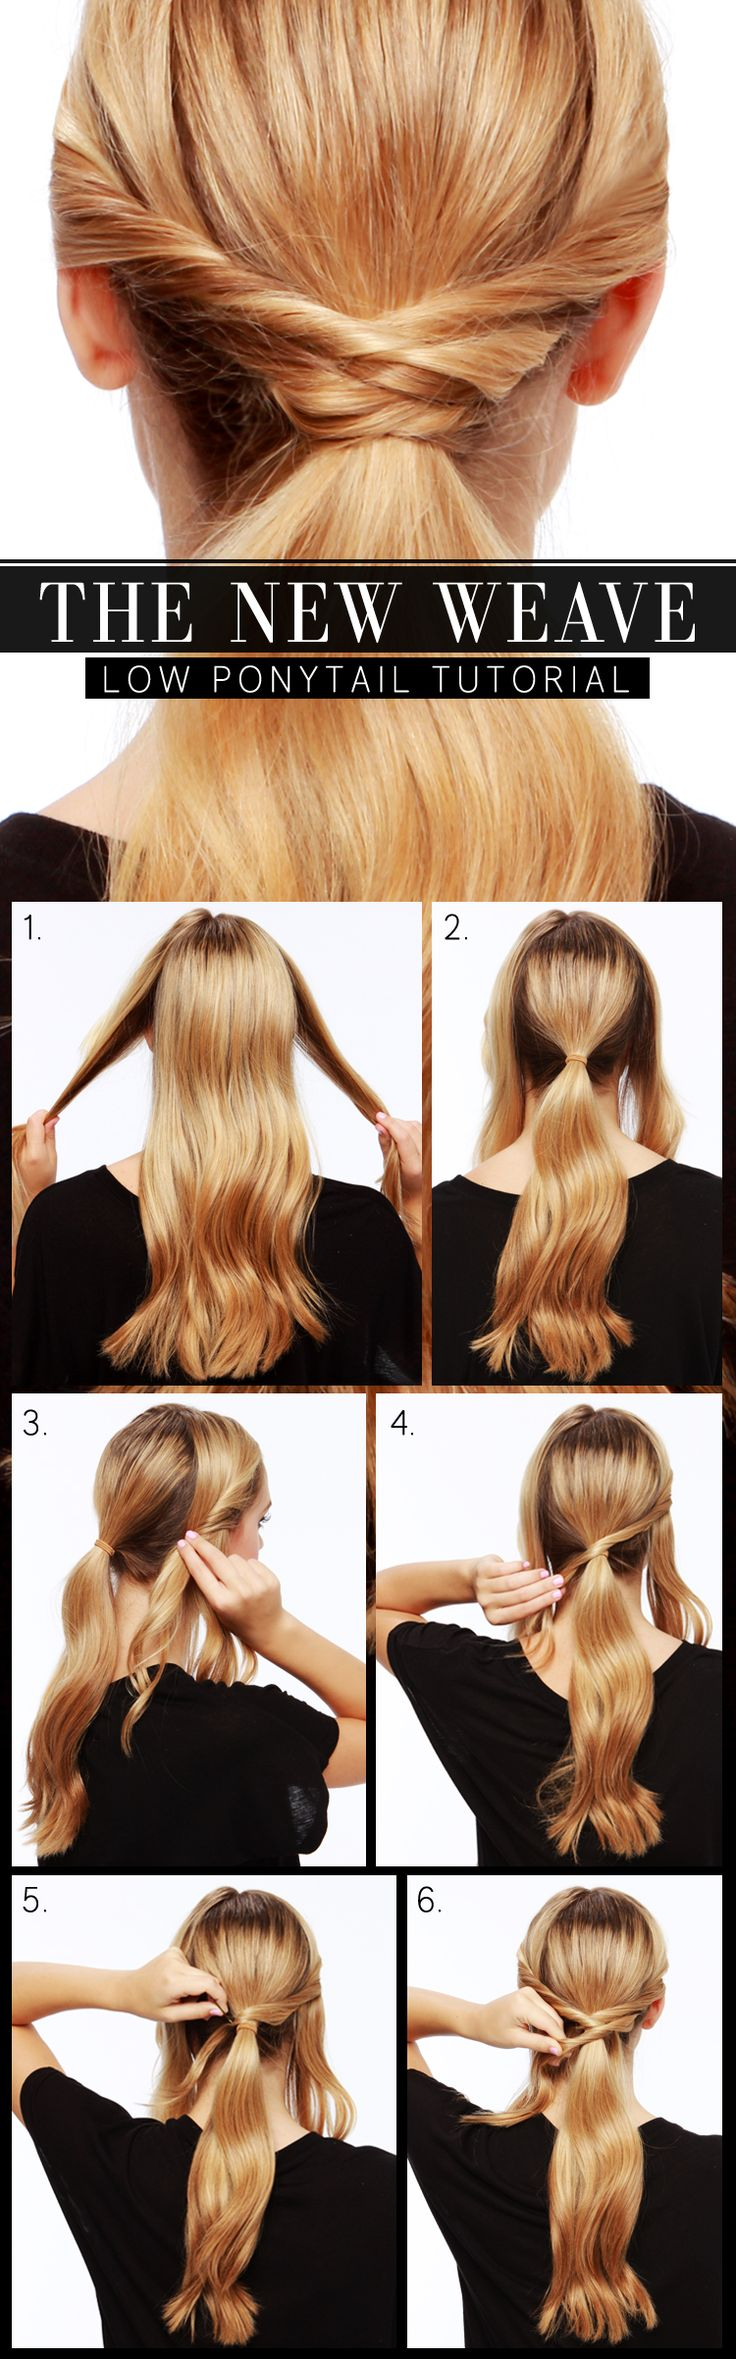 Awe Inspiring Hair Styles Ideas Low Woven Ponytail Tutorial Smyblog Com Schematic Wiring Diagrams Amerangerunnerswayorg